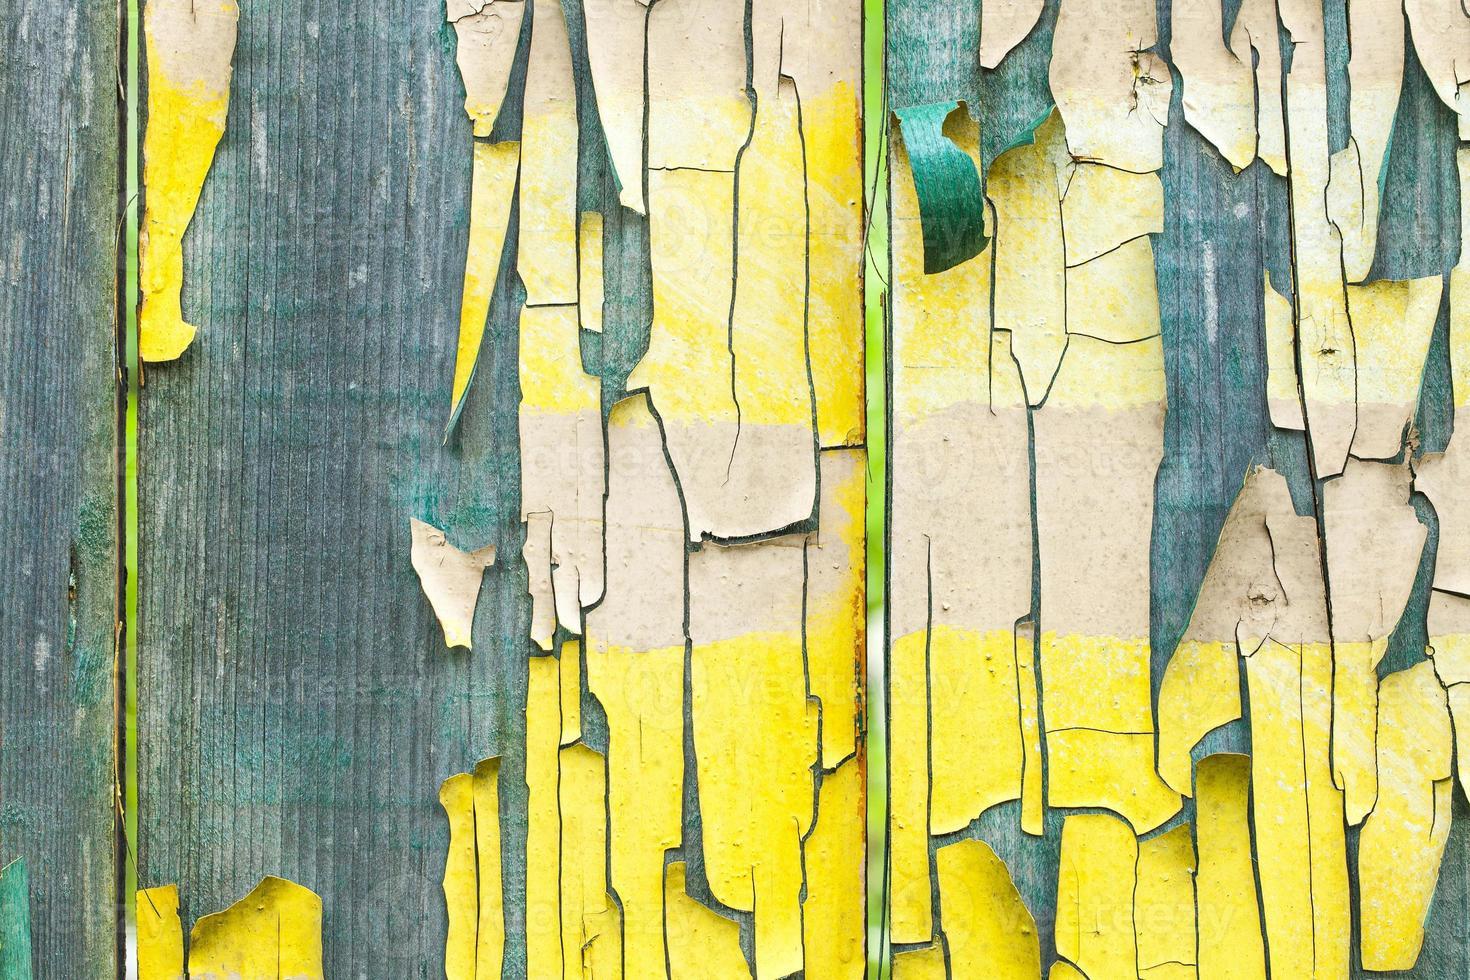 textura de paneles de madera de grunge foto